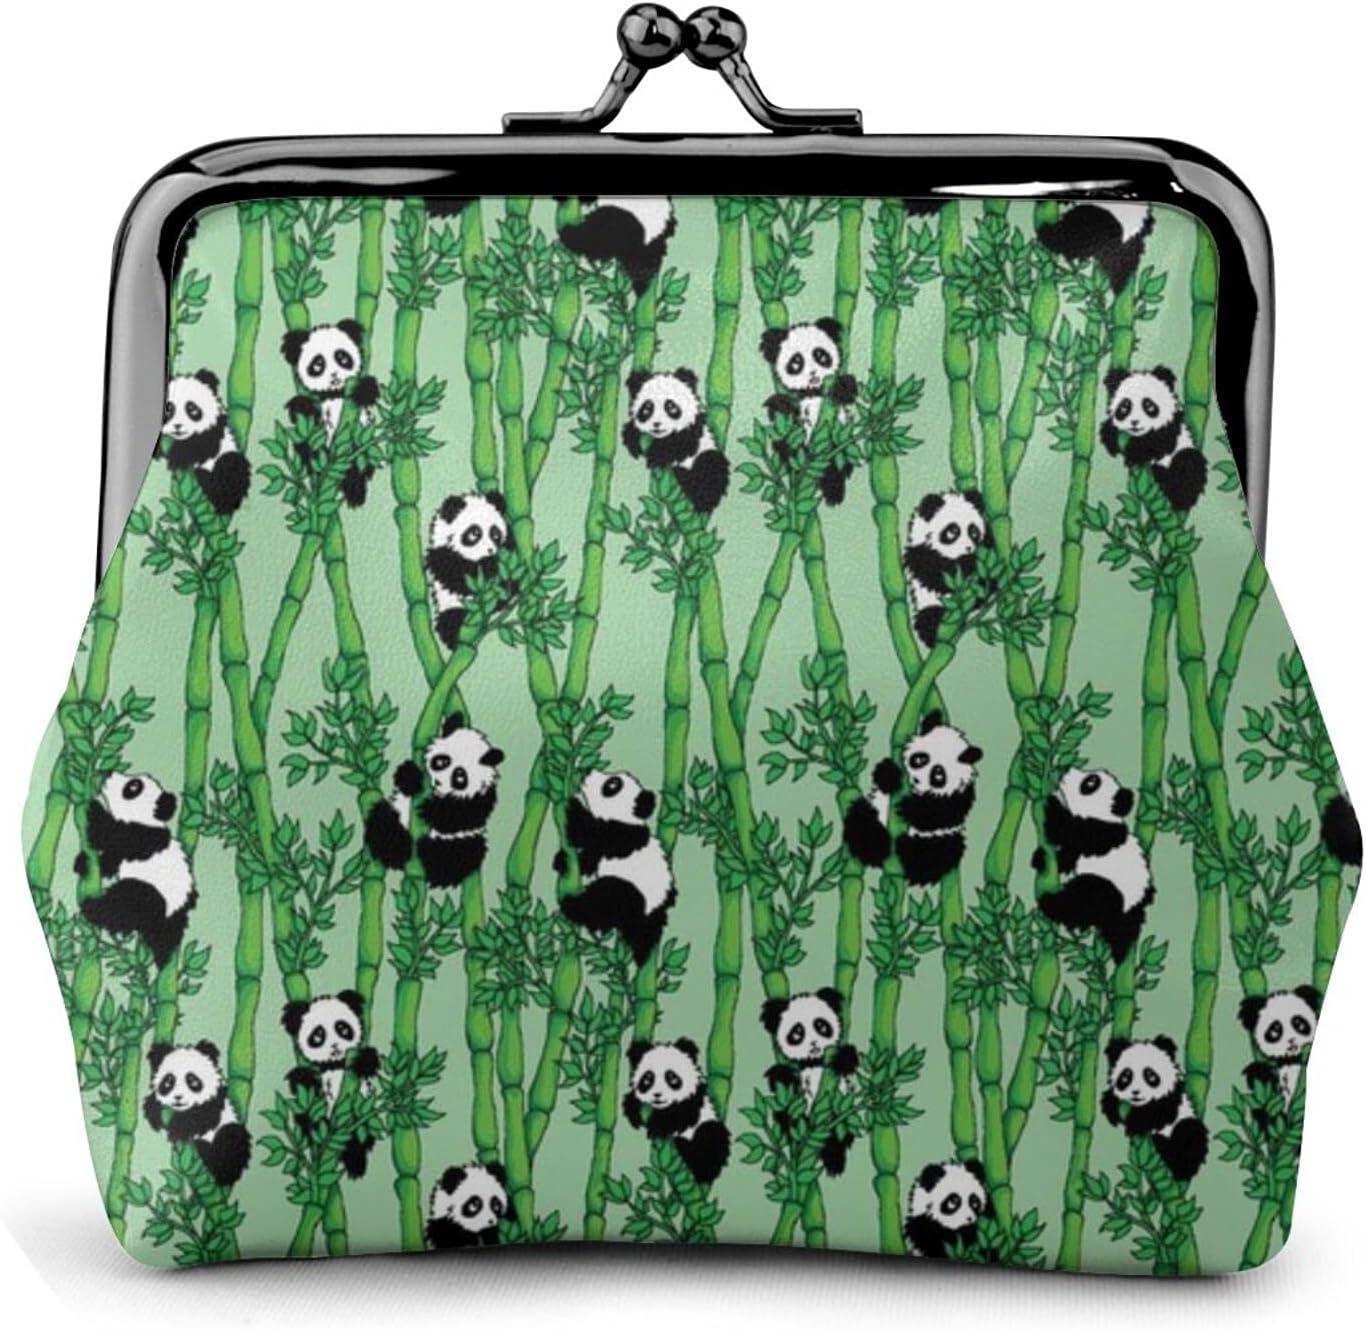 Bamboo Panda 243 Women'S Wallet Buckle Coin Purses Pouch Kiss-lock Change Travel Makeup Wallets, Black, One Size